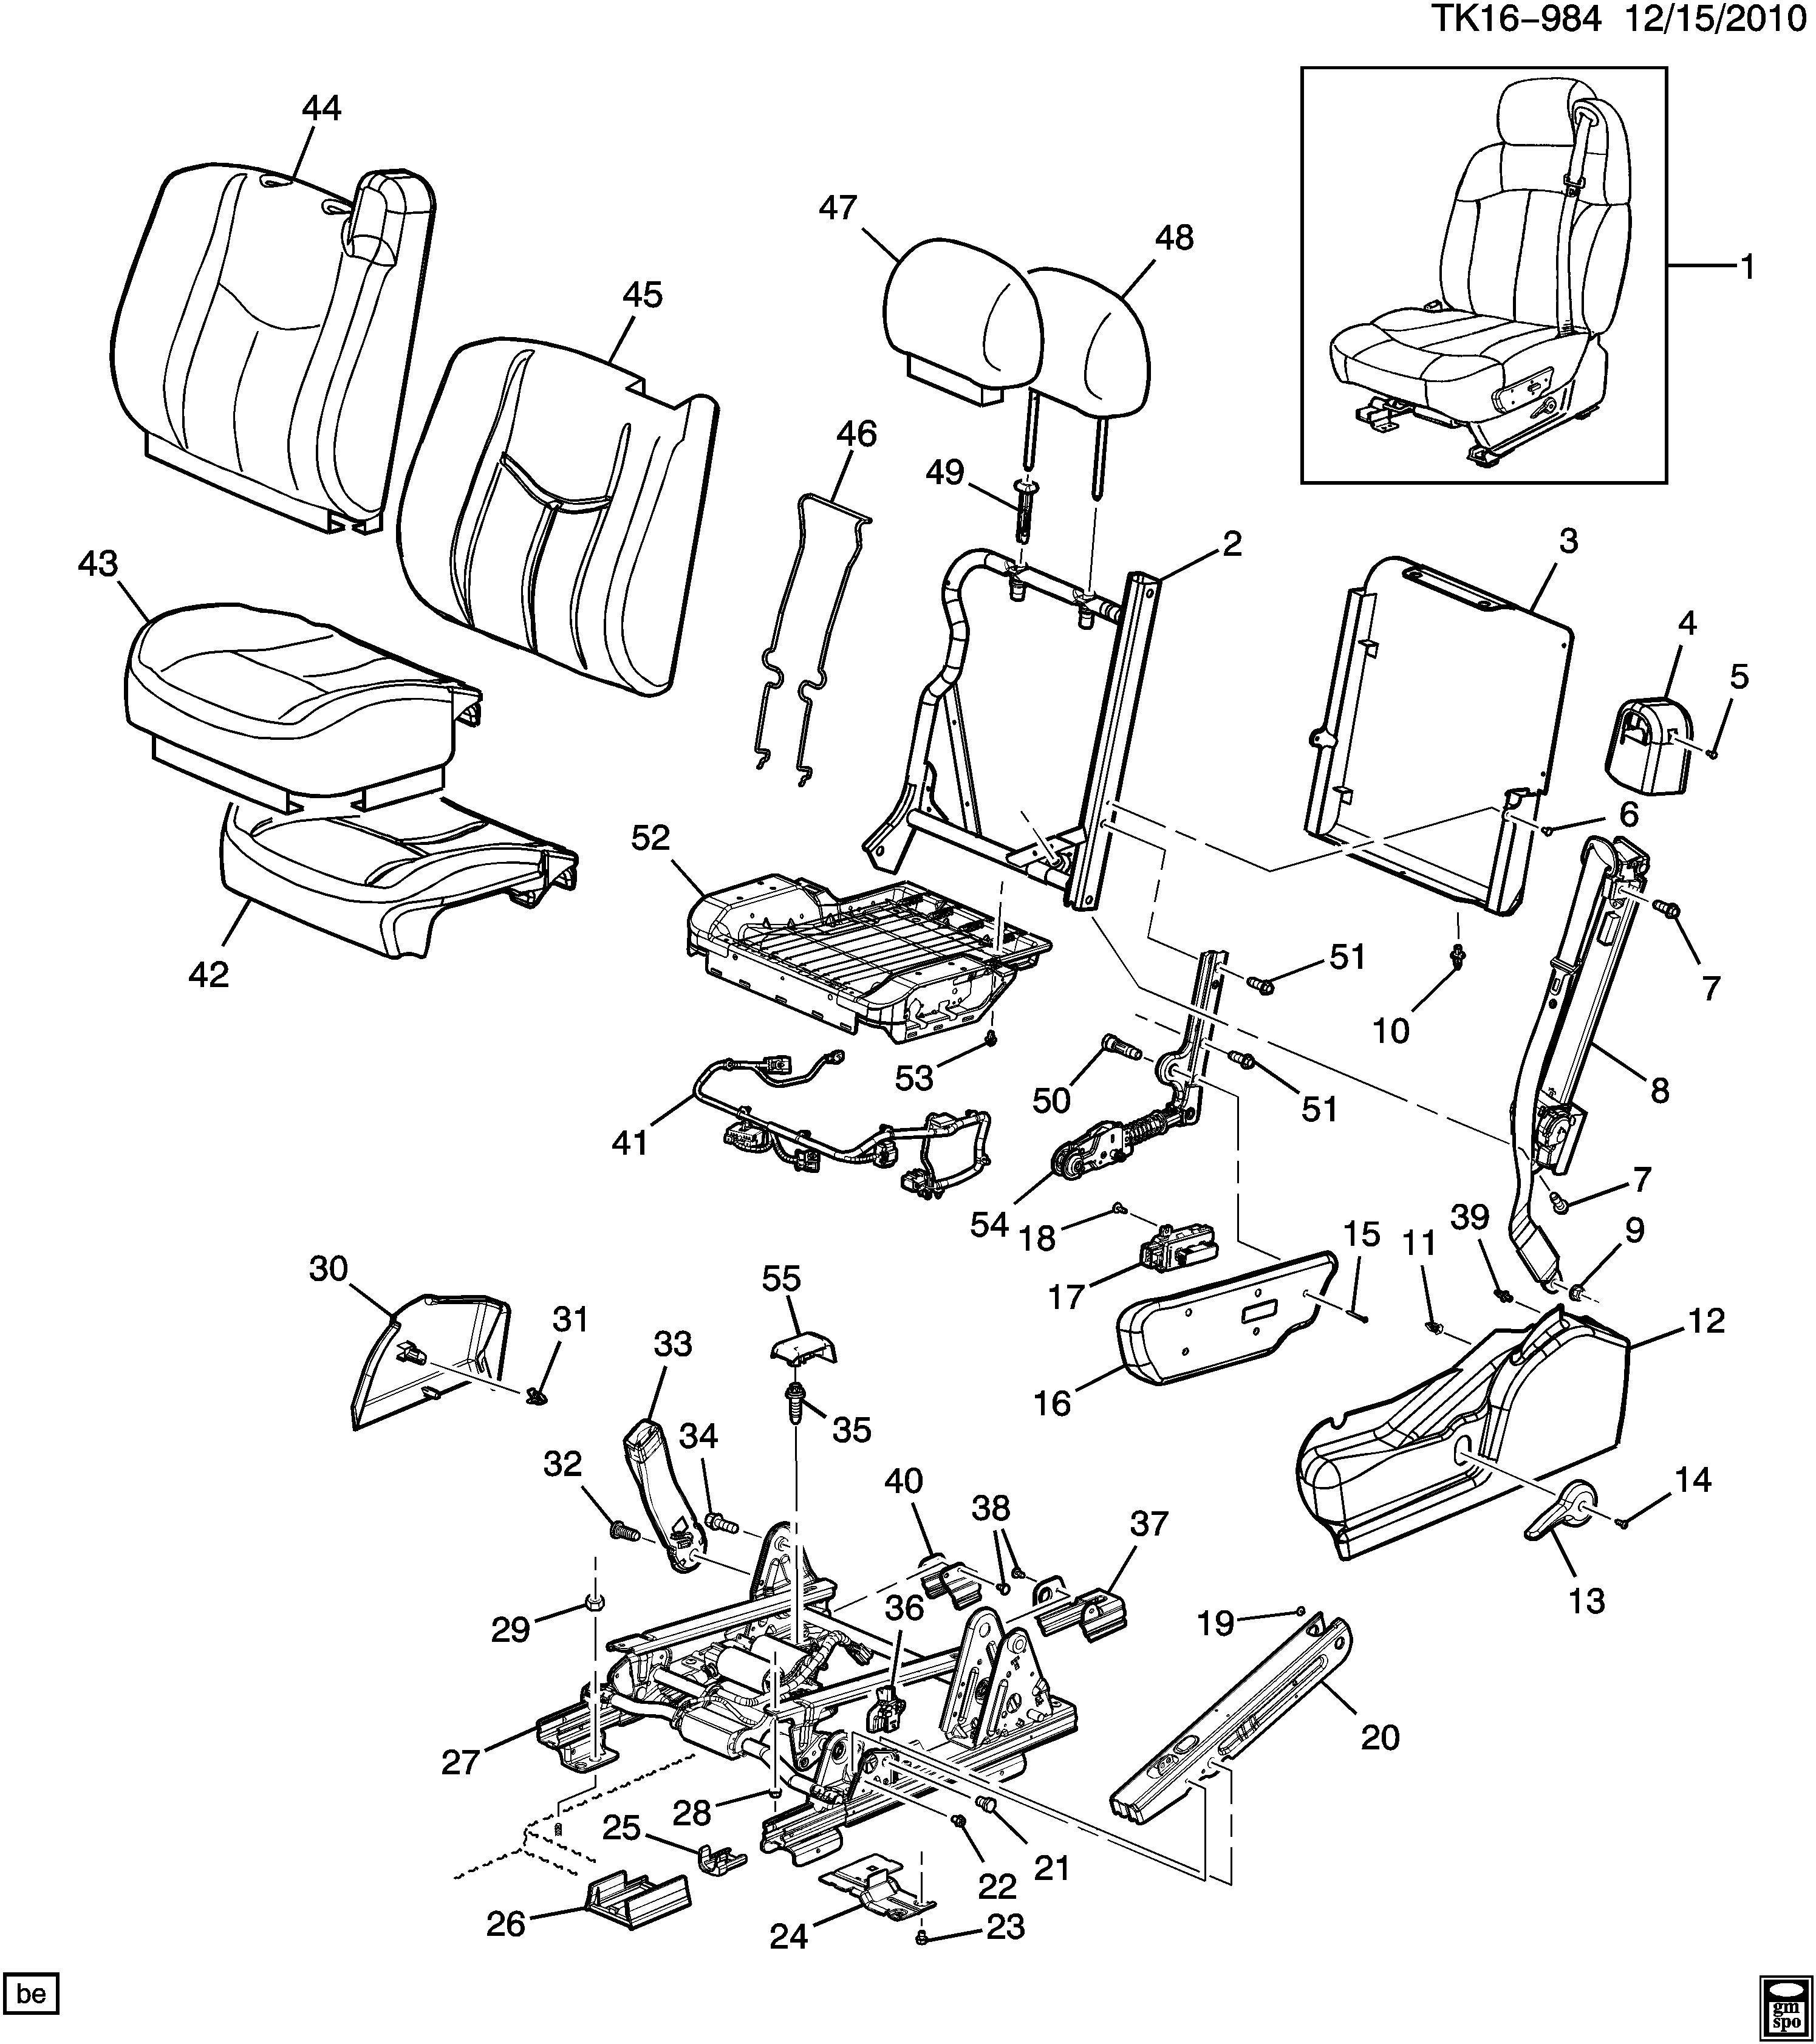 Chevrolet Silverado DRIVER SEAT/SPLIT BENCH